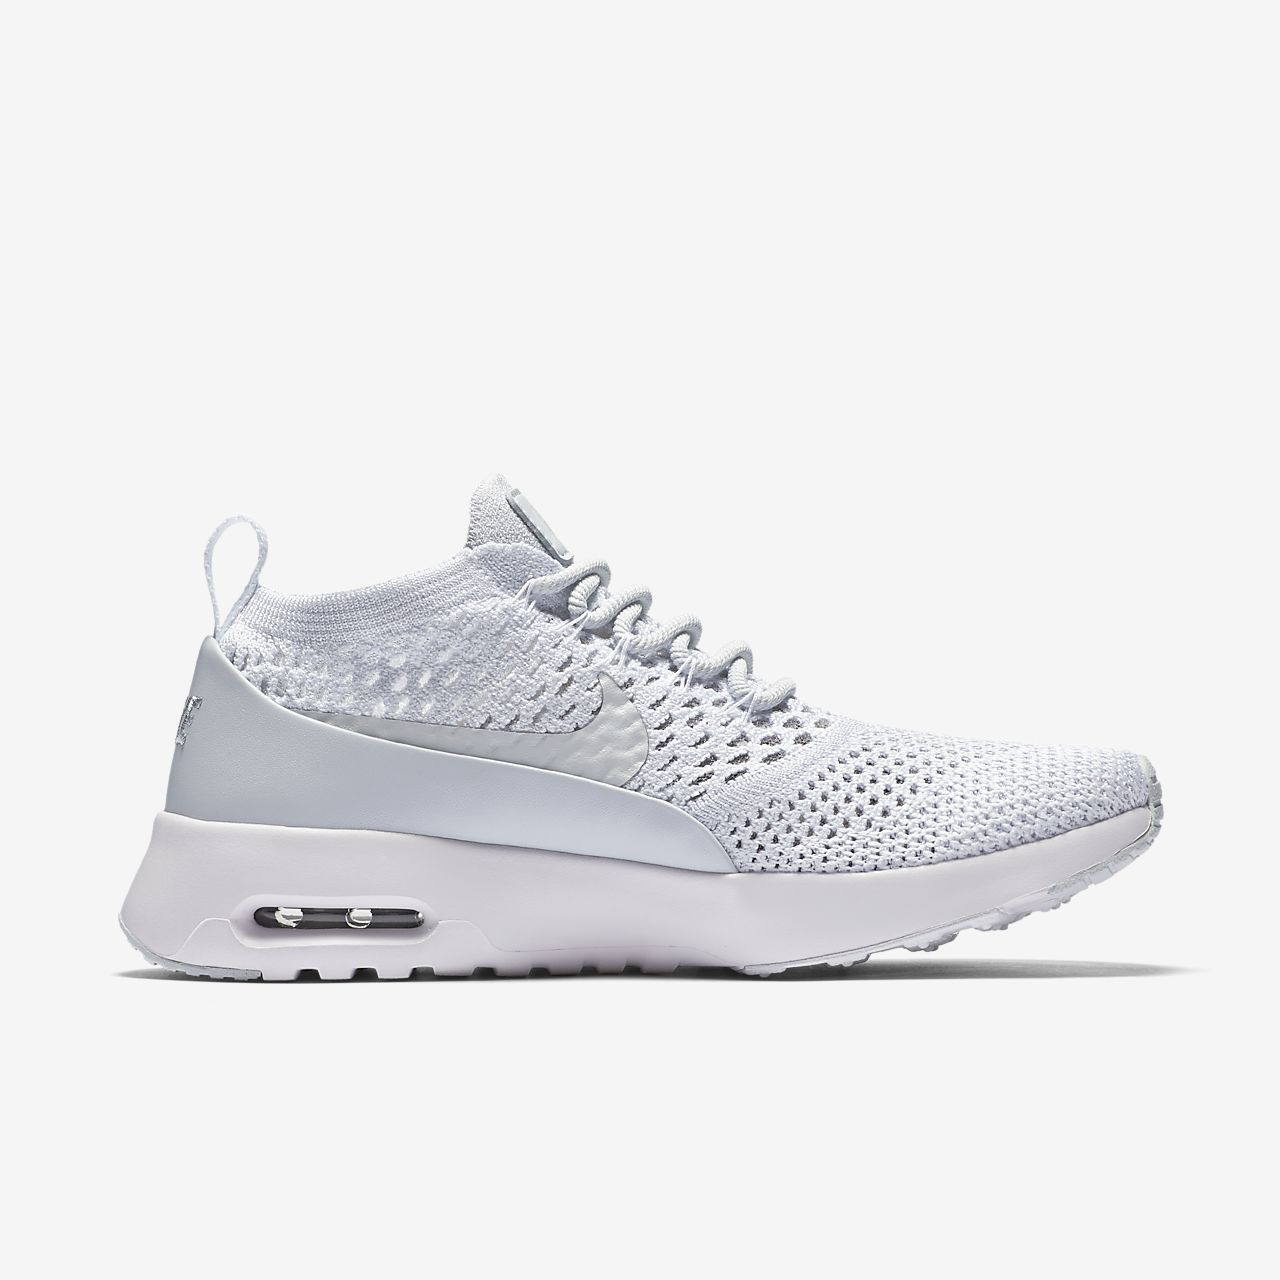 Air Max Femme Thea Ultra Flyknit Chaussures De Course Nike 6BWiyDJe